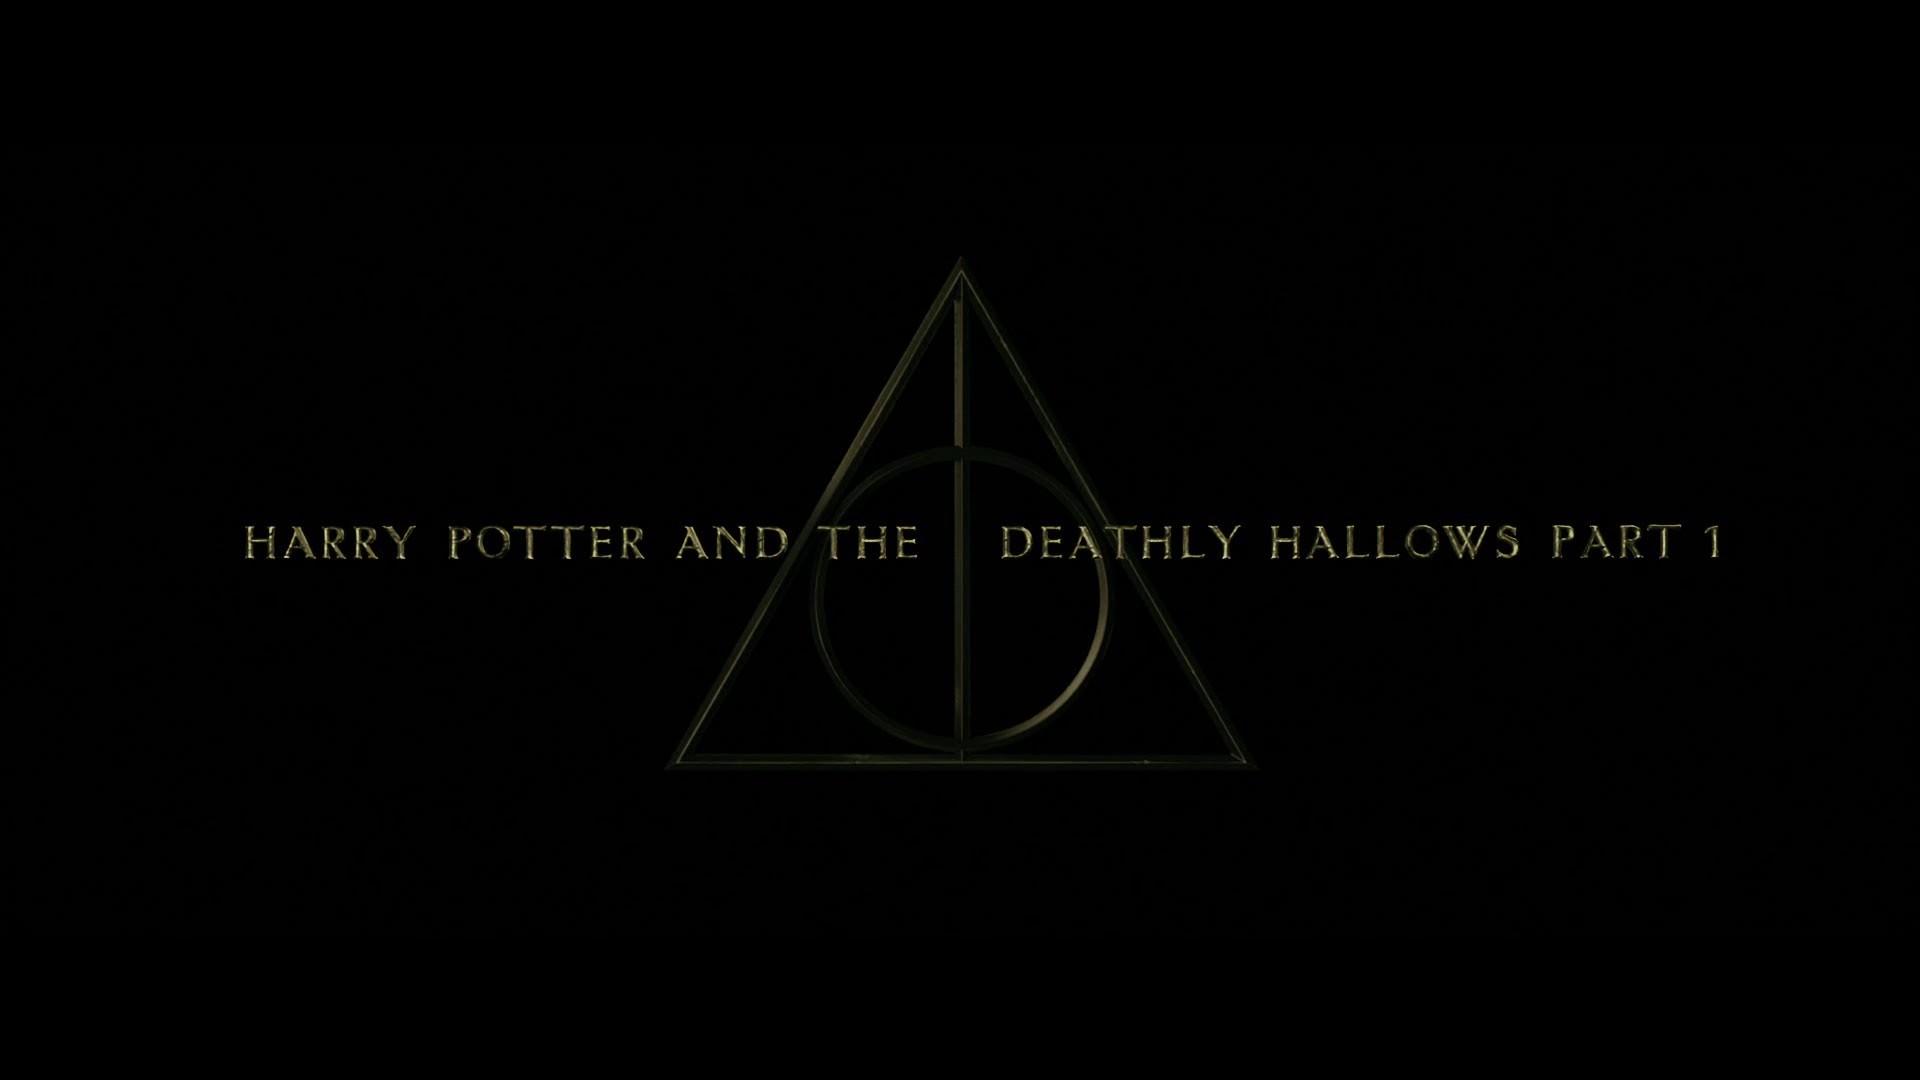 Download Wallpaper Harry Potter Black - 795915-deathly-hallows-symbol-wallpaper-1920x1080-for-pc  2018_959661.jpg